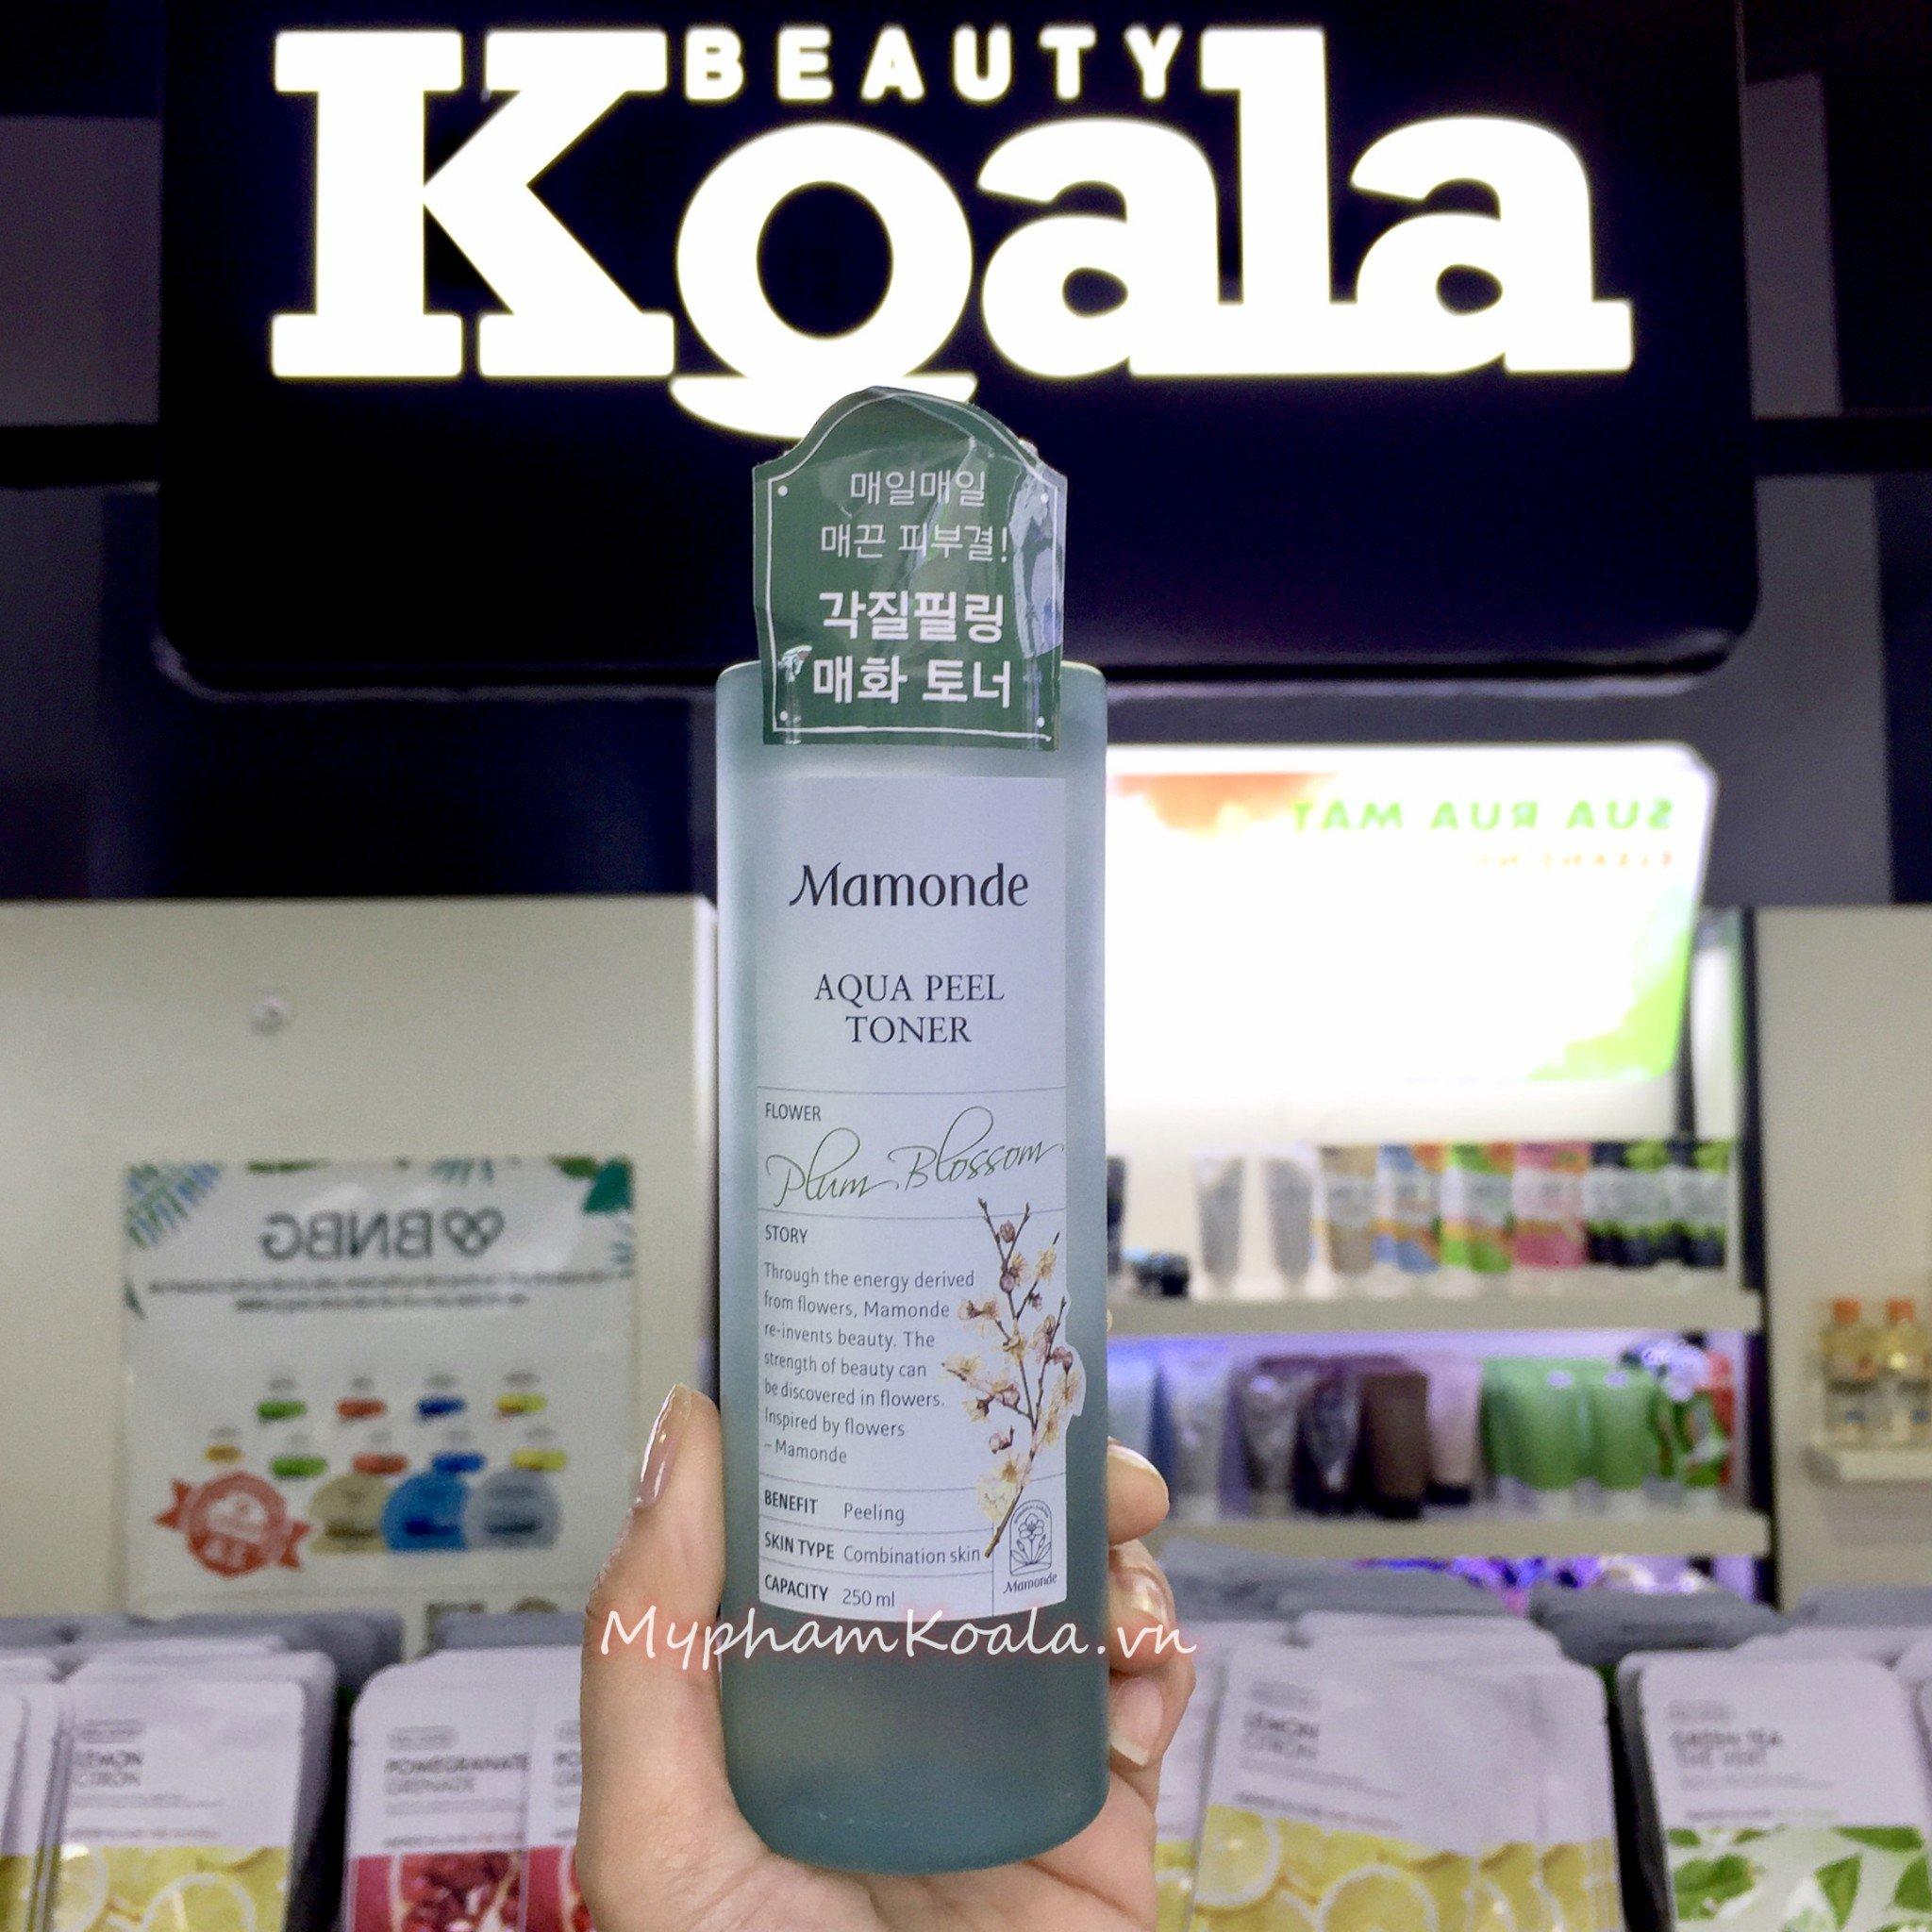 Nước Hoa Hồng Tái Tạo Da Cấp Nước Ngừa Mụn Mamonde Aqua Peel Toner Plum Blossom